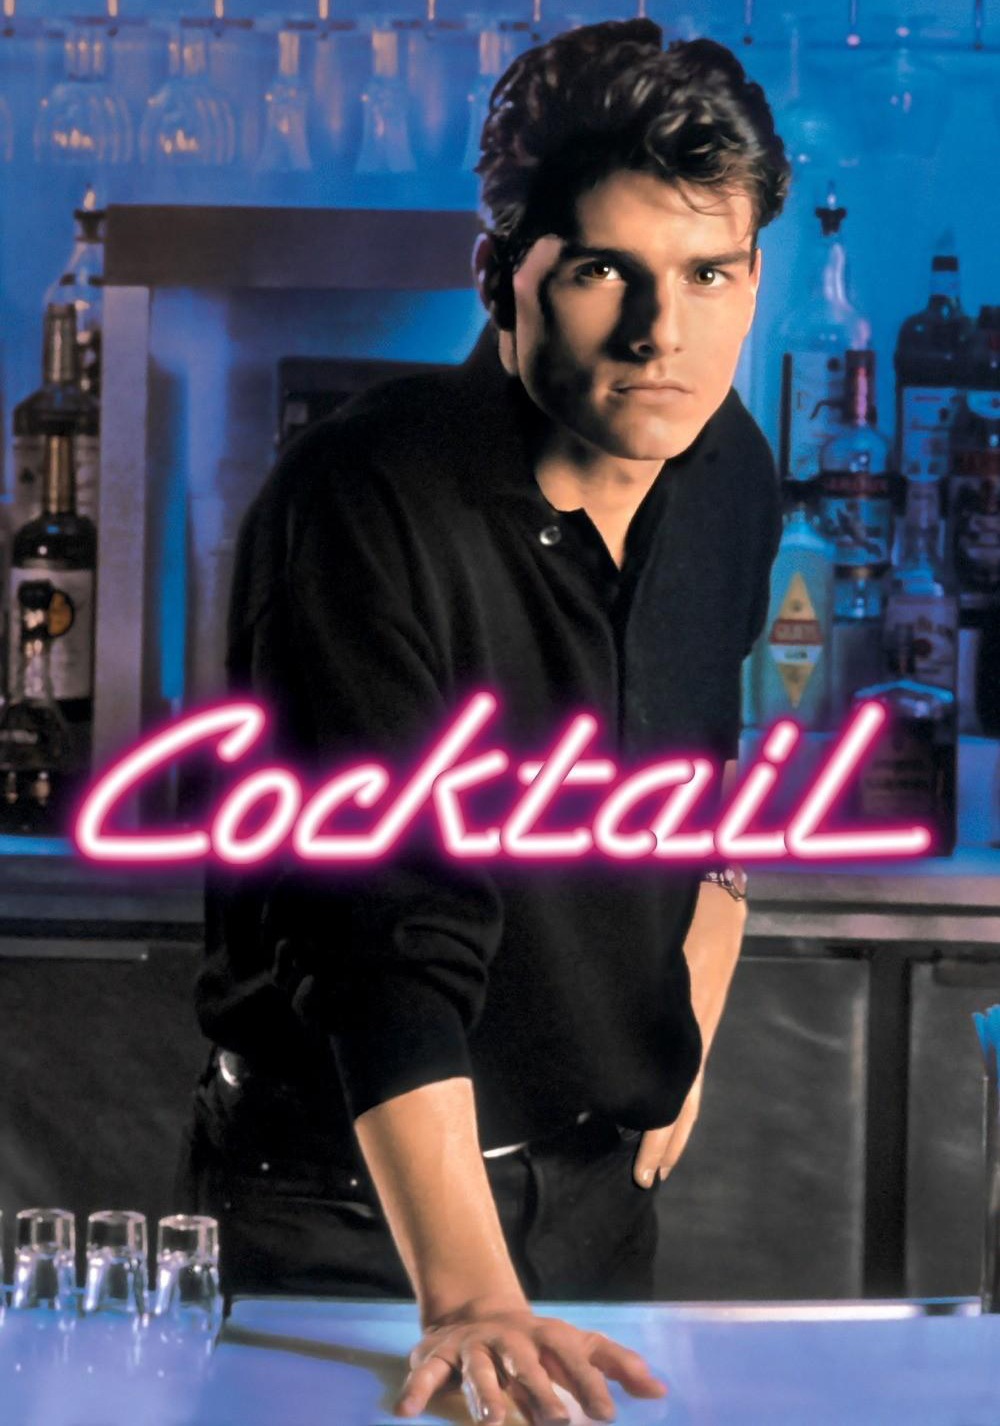 Cocktail Film